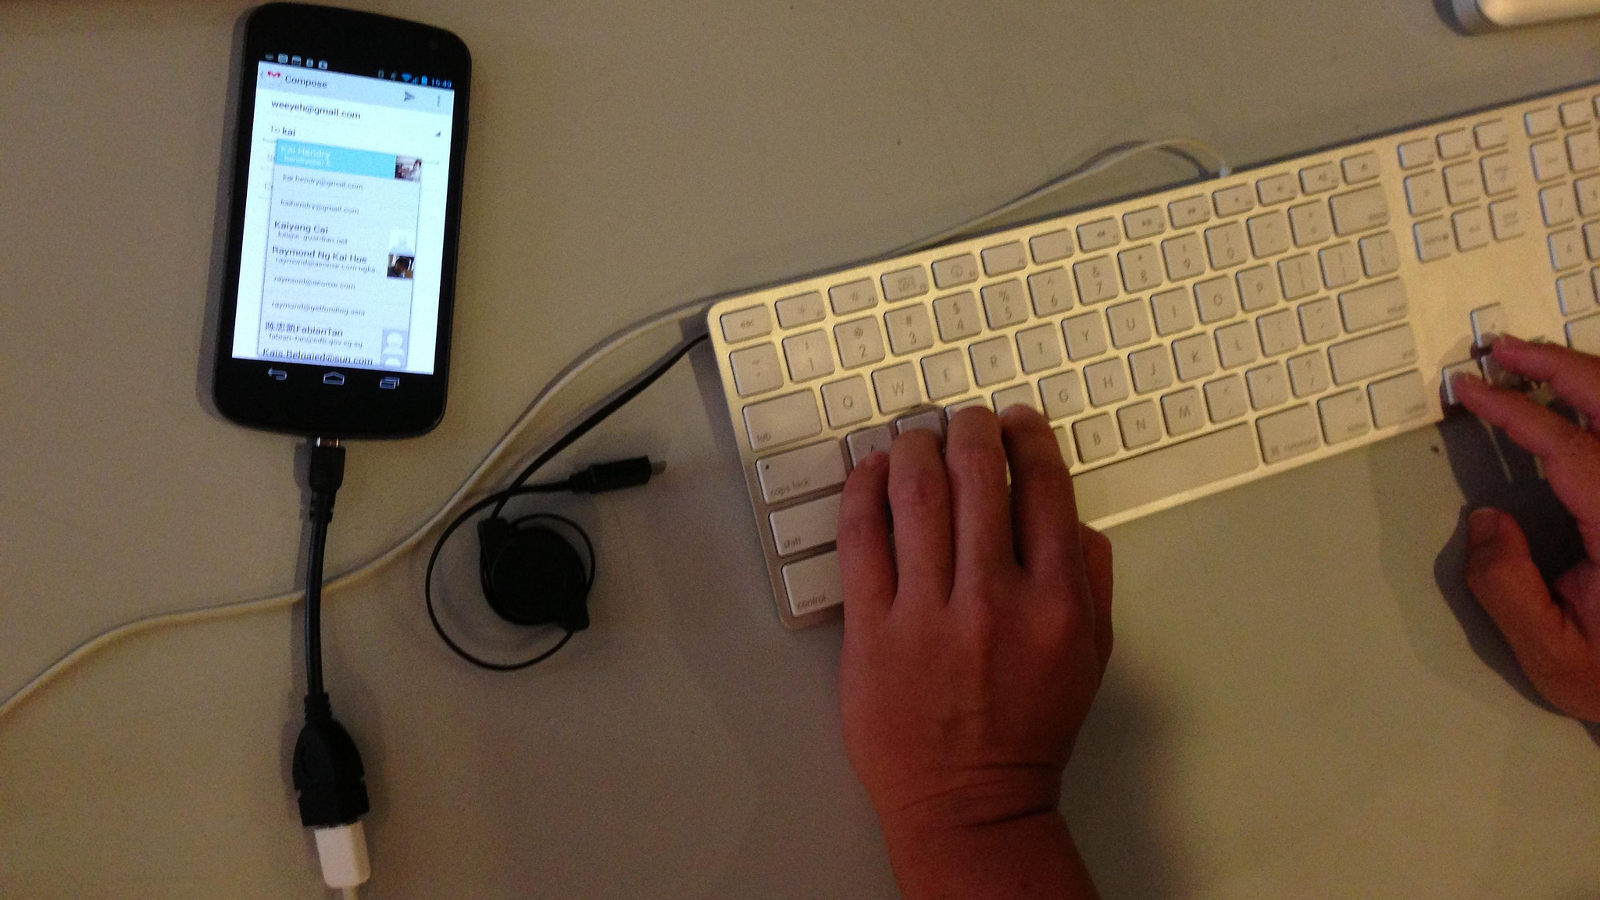 Android USB keyboard, Kai Hendry Flickr